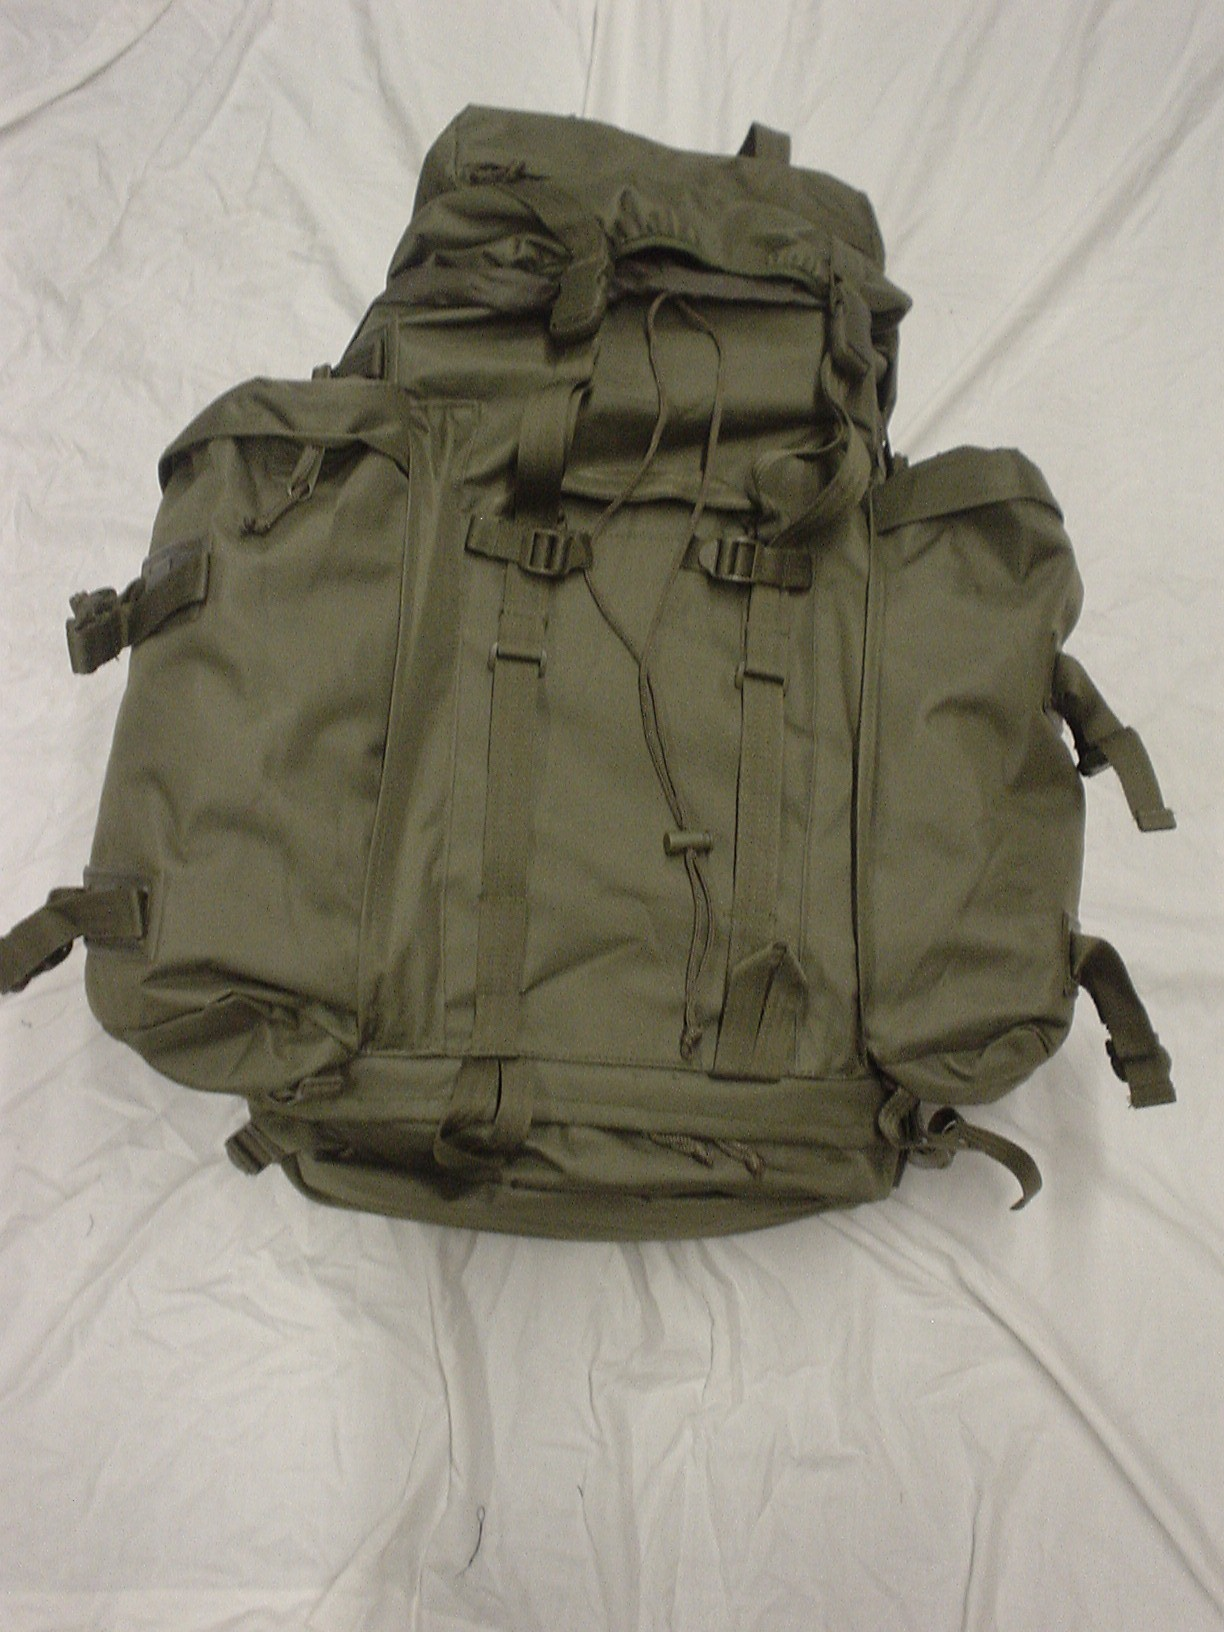 Olive drab combat rack sack